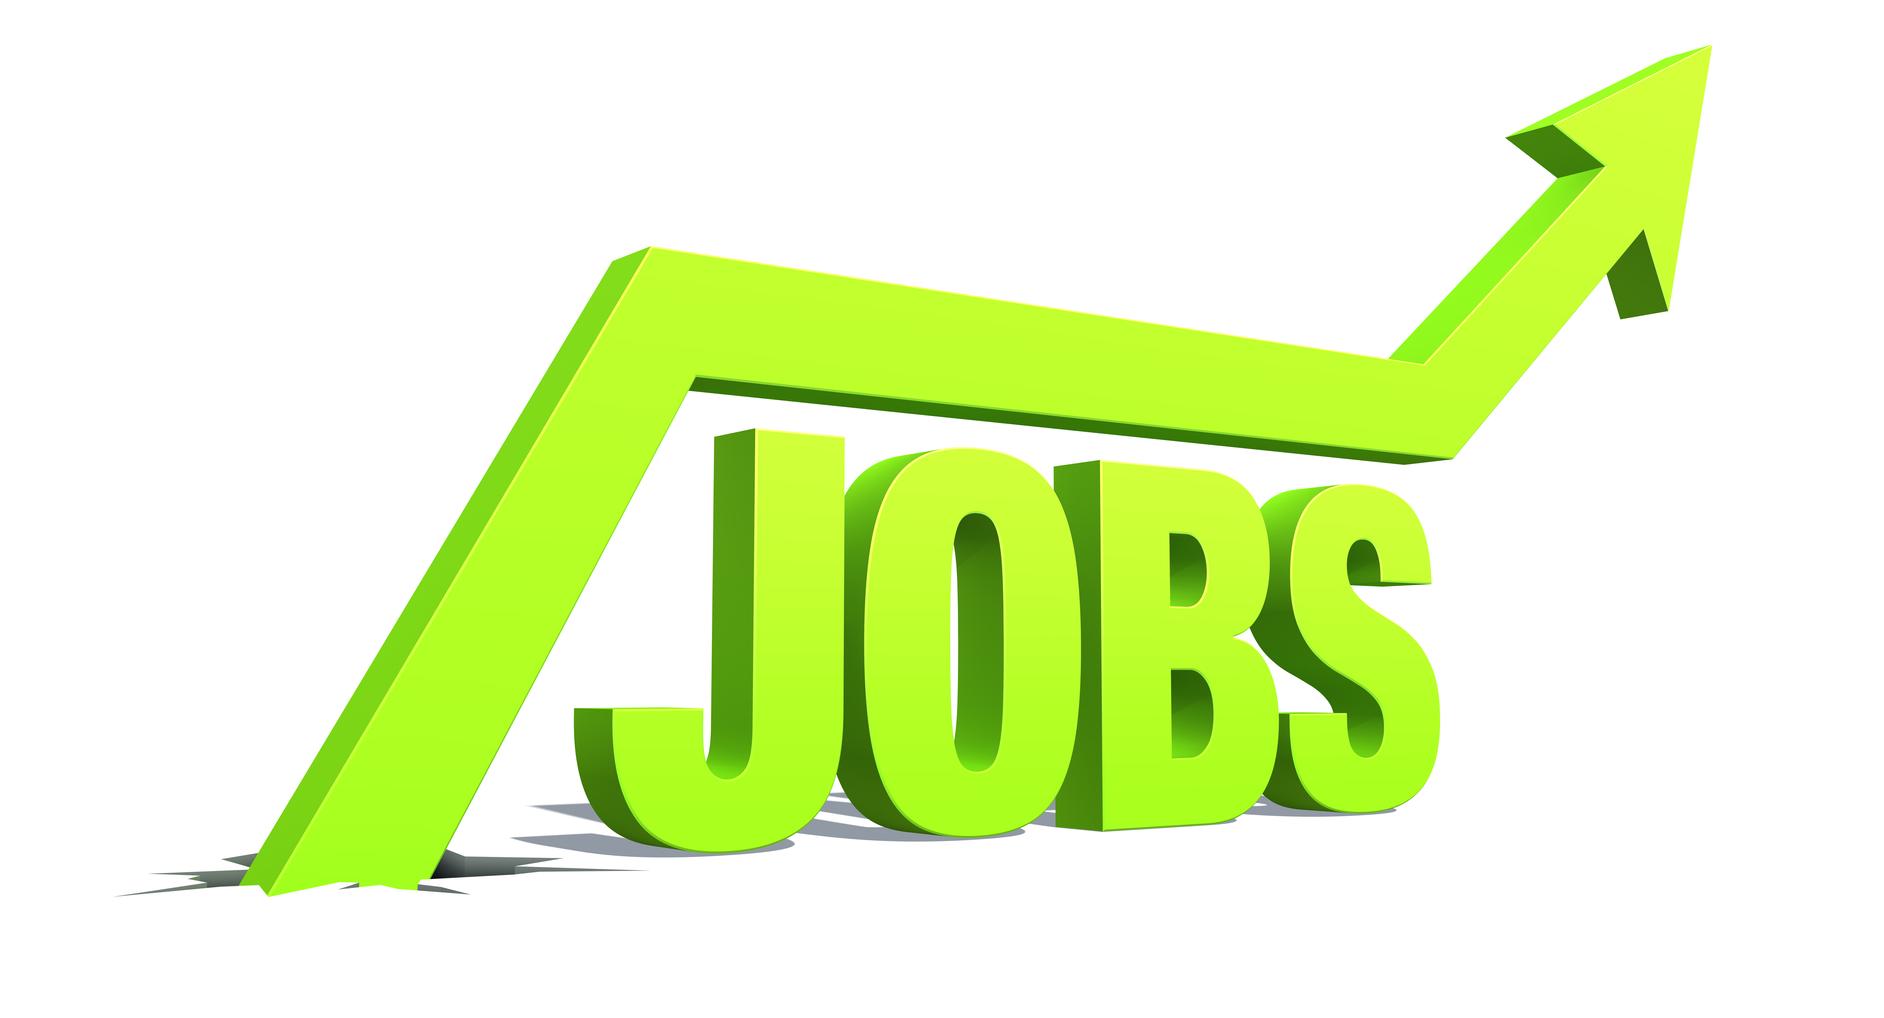 OOD - Trucking Insurance - Jobs